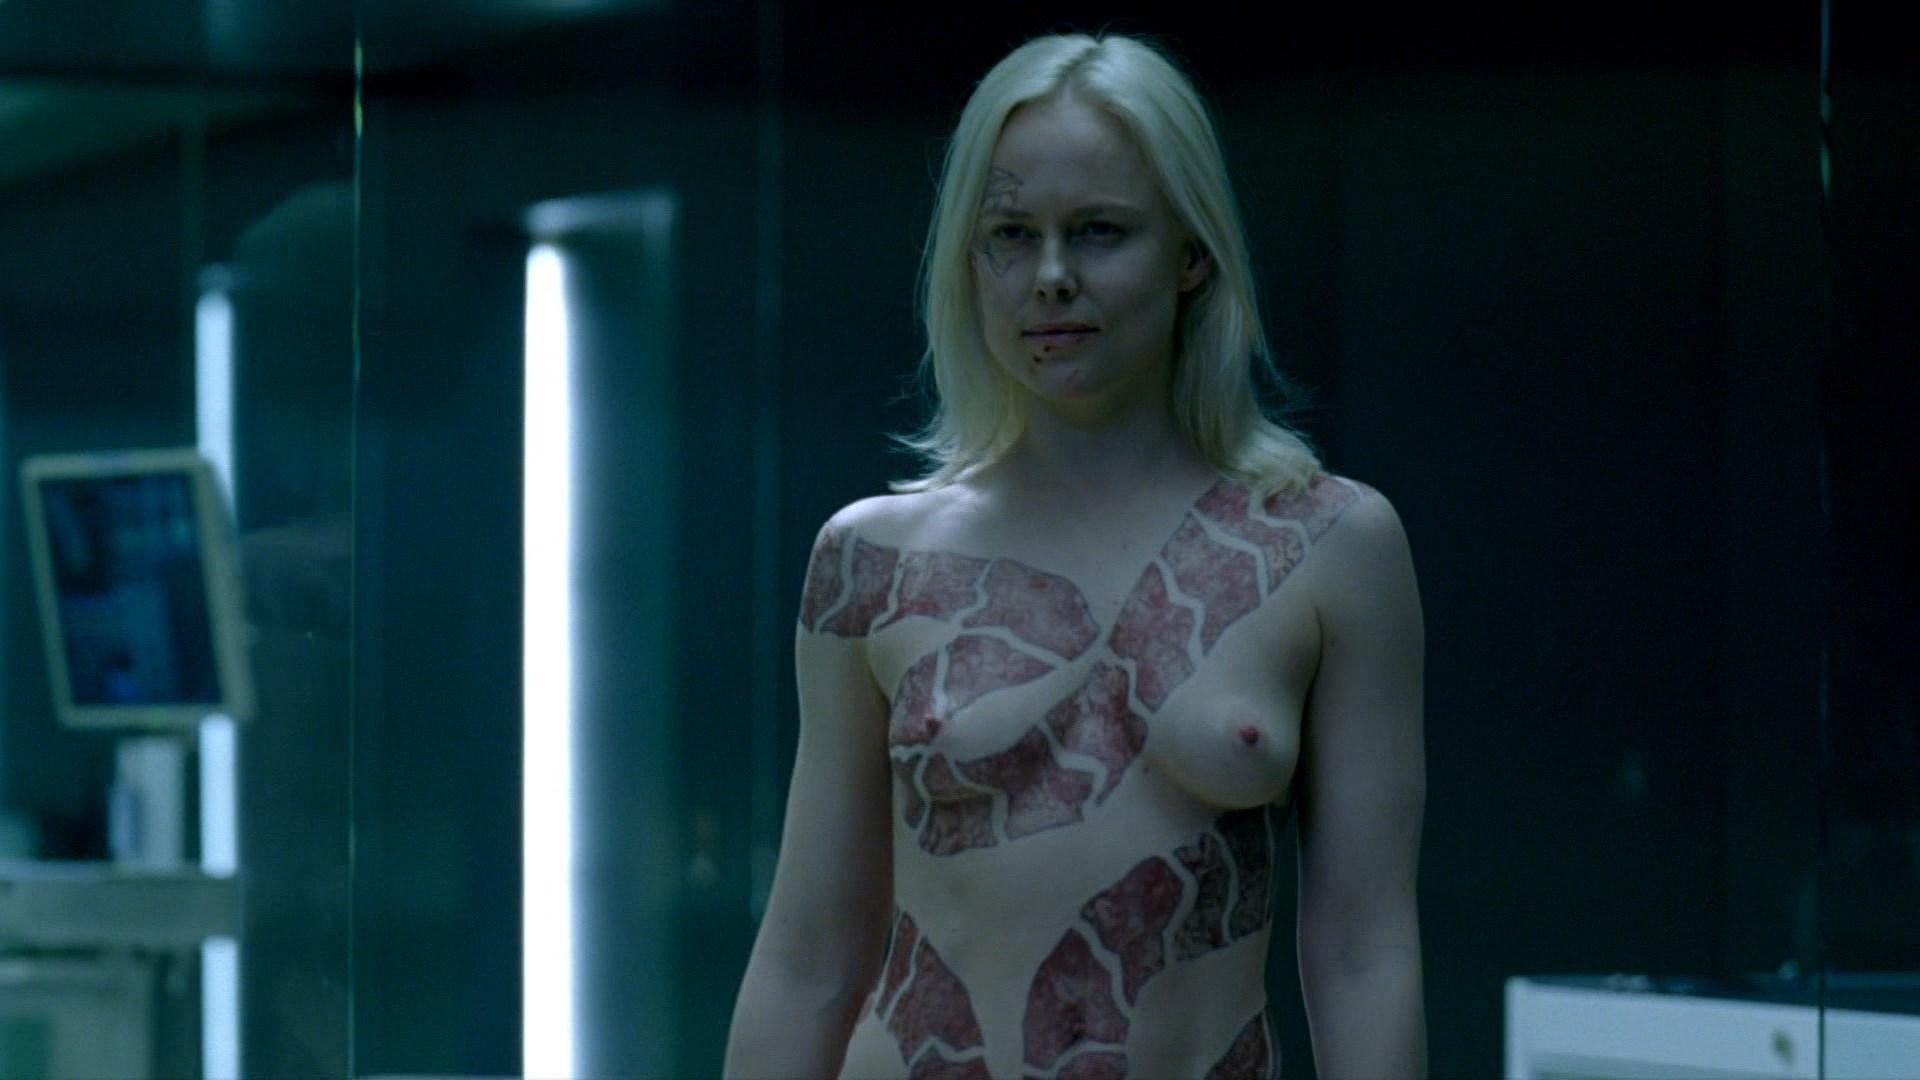 Ingrid Bolsø Berdal Naked ingrid bols berdal nude westworld s e hd p thefappening